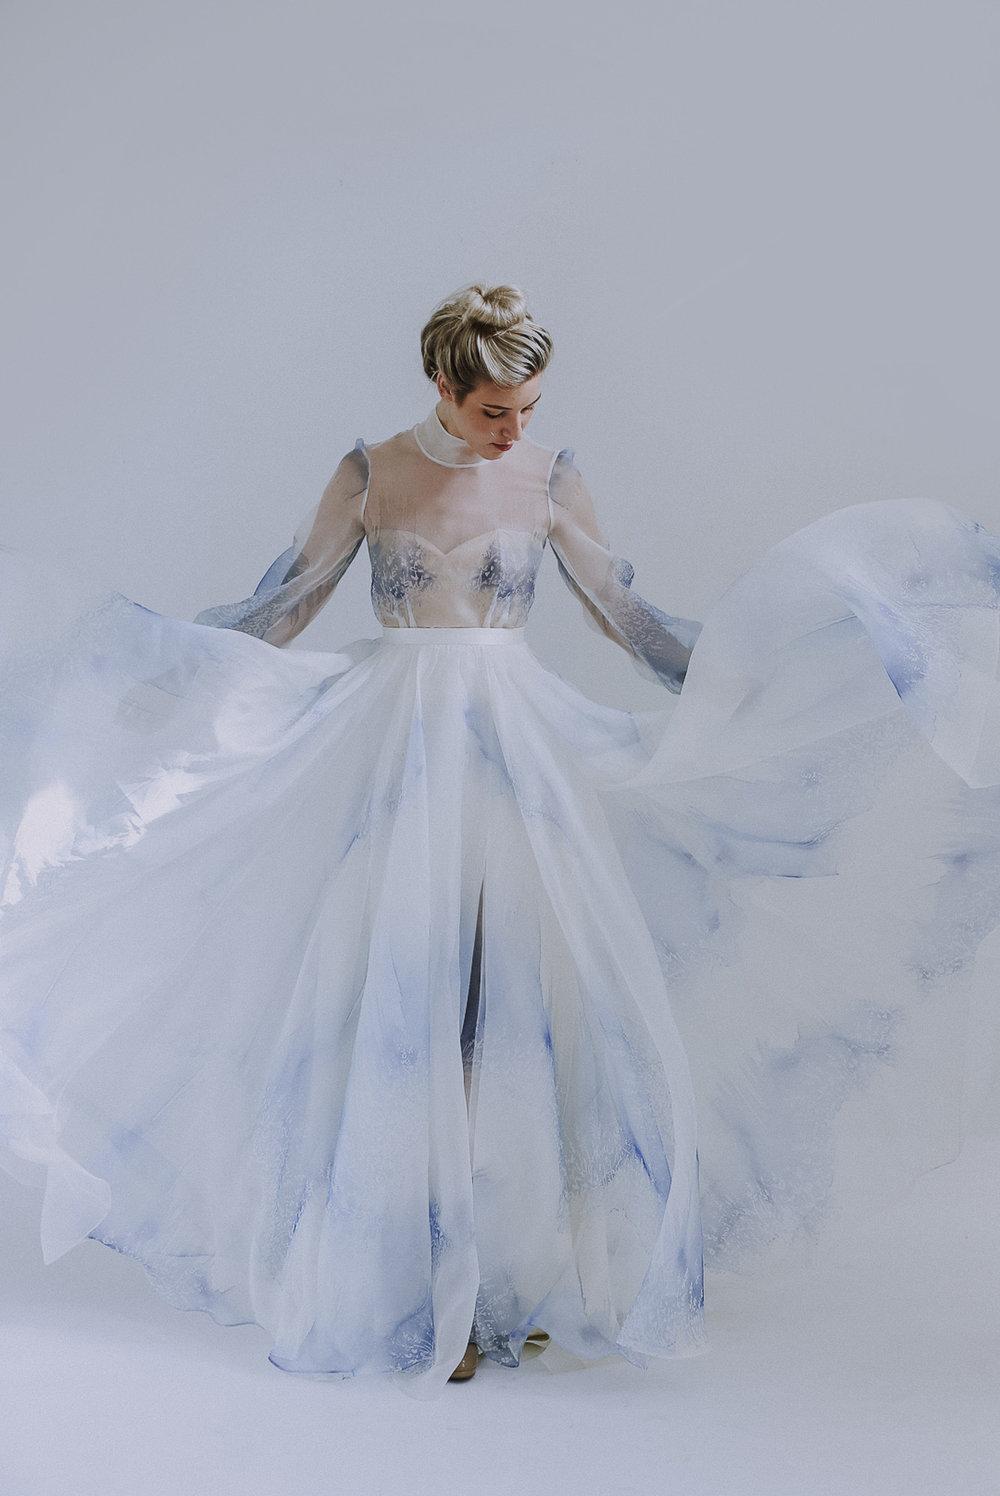 leanne-marshall-wedding-gown-3.jpg